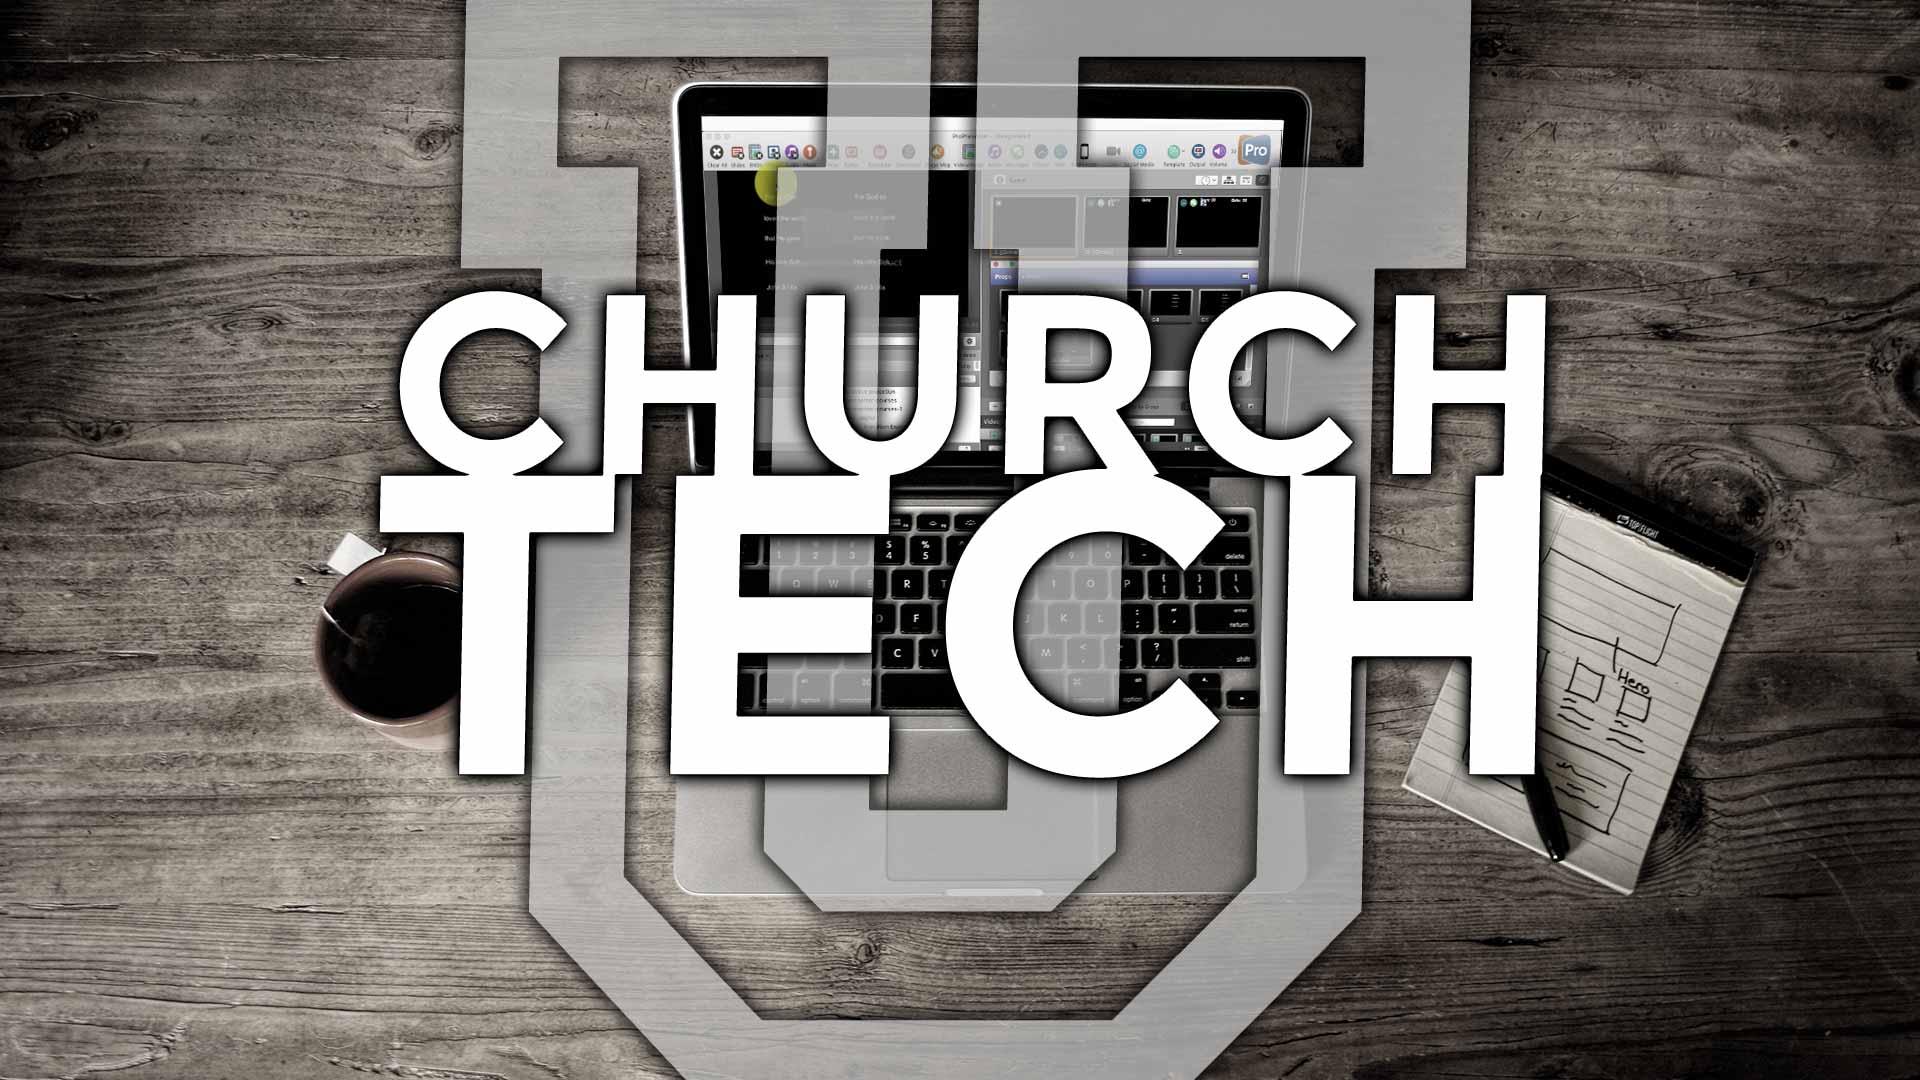 ChurchTechU